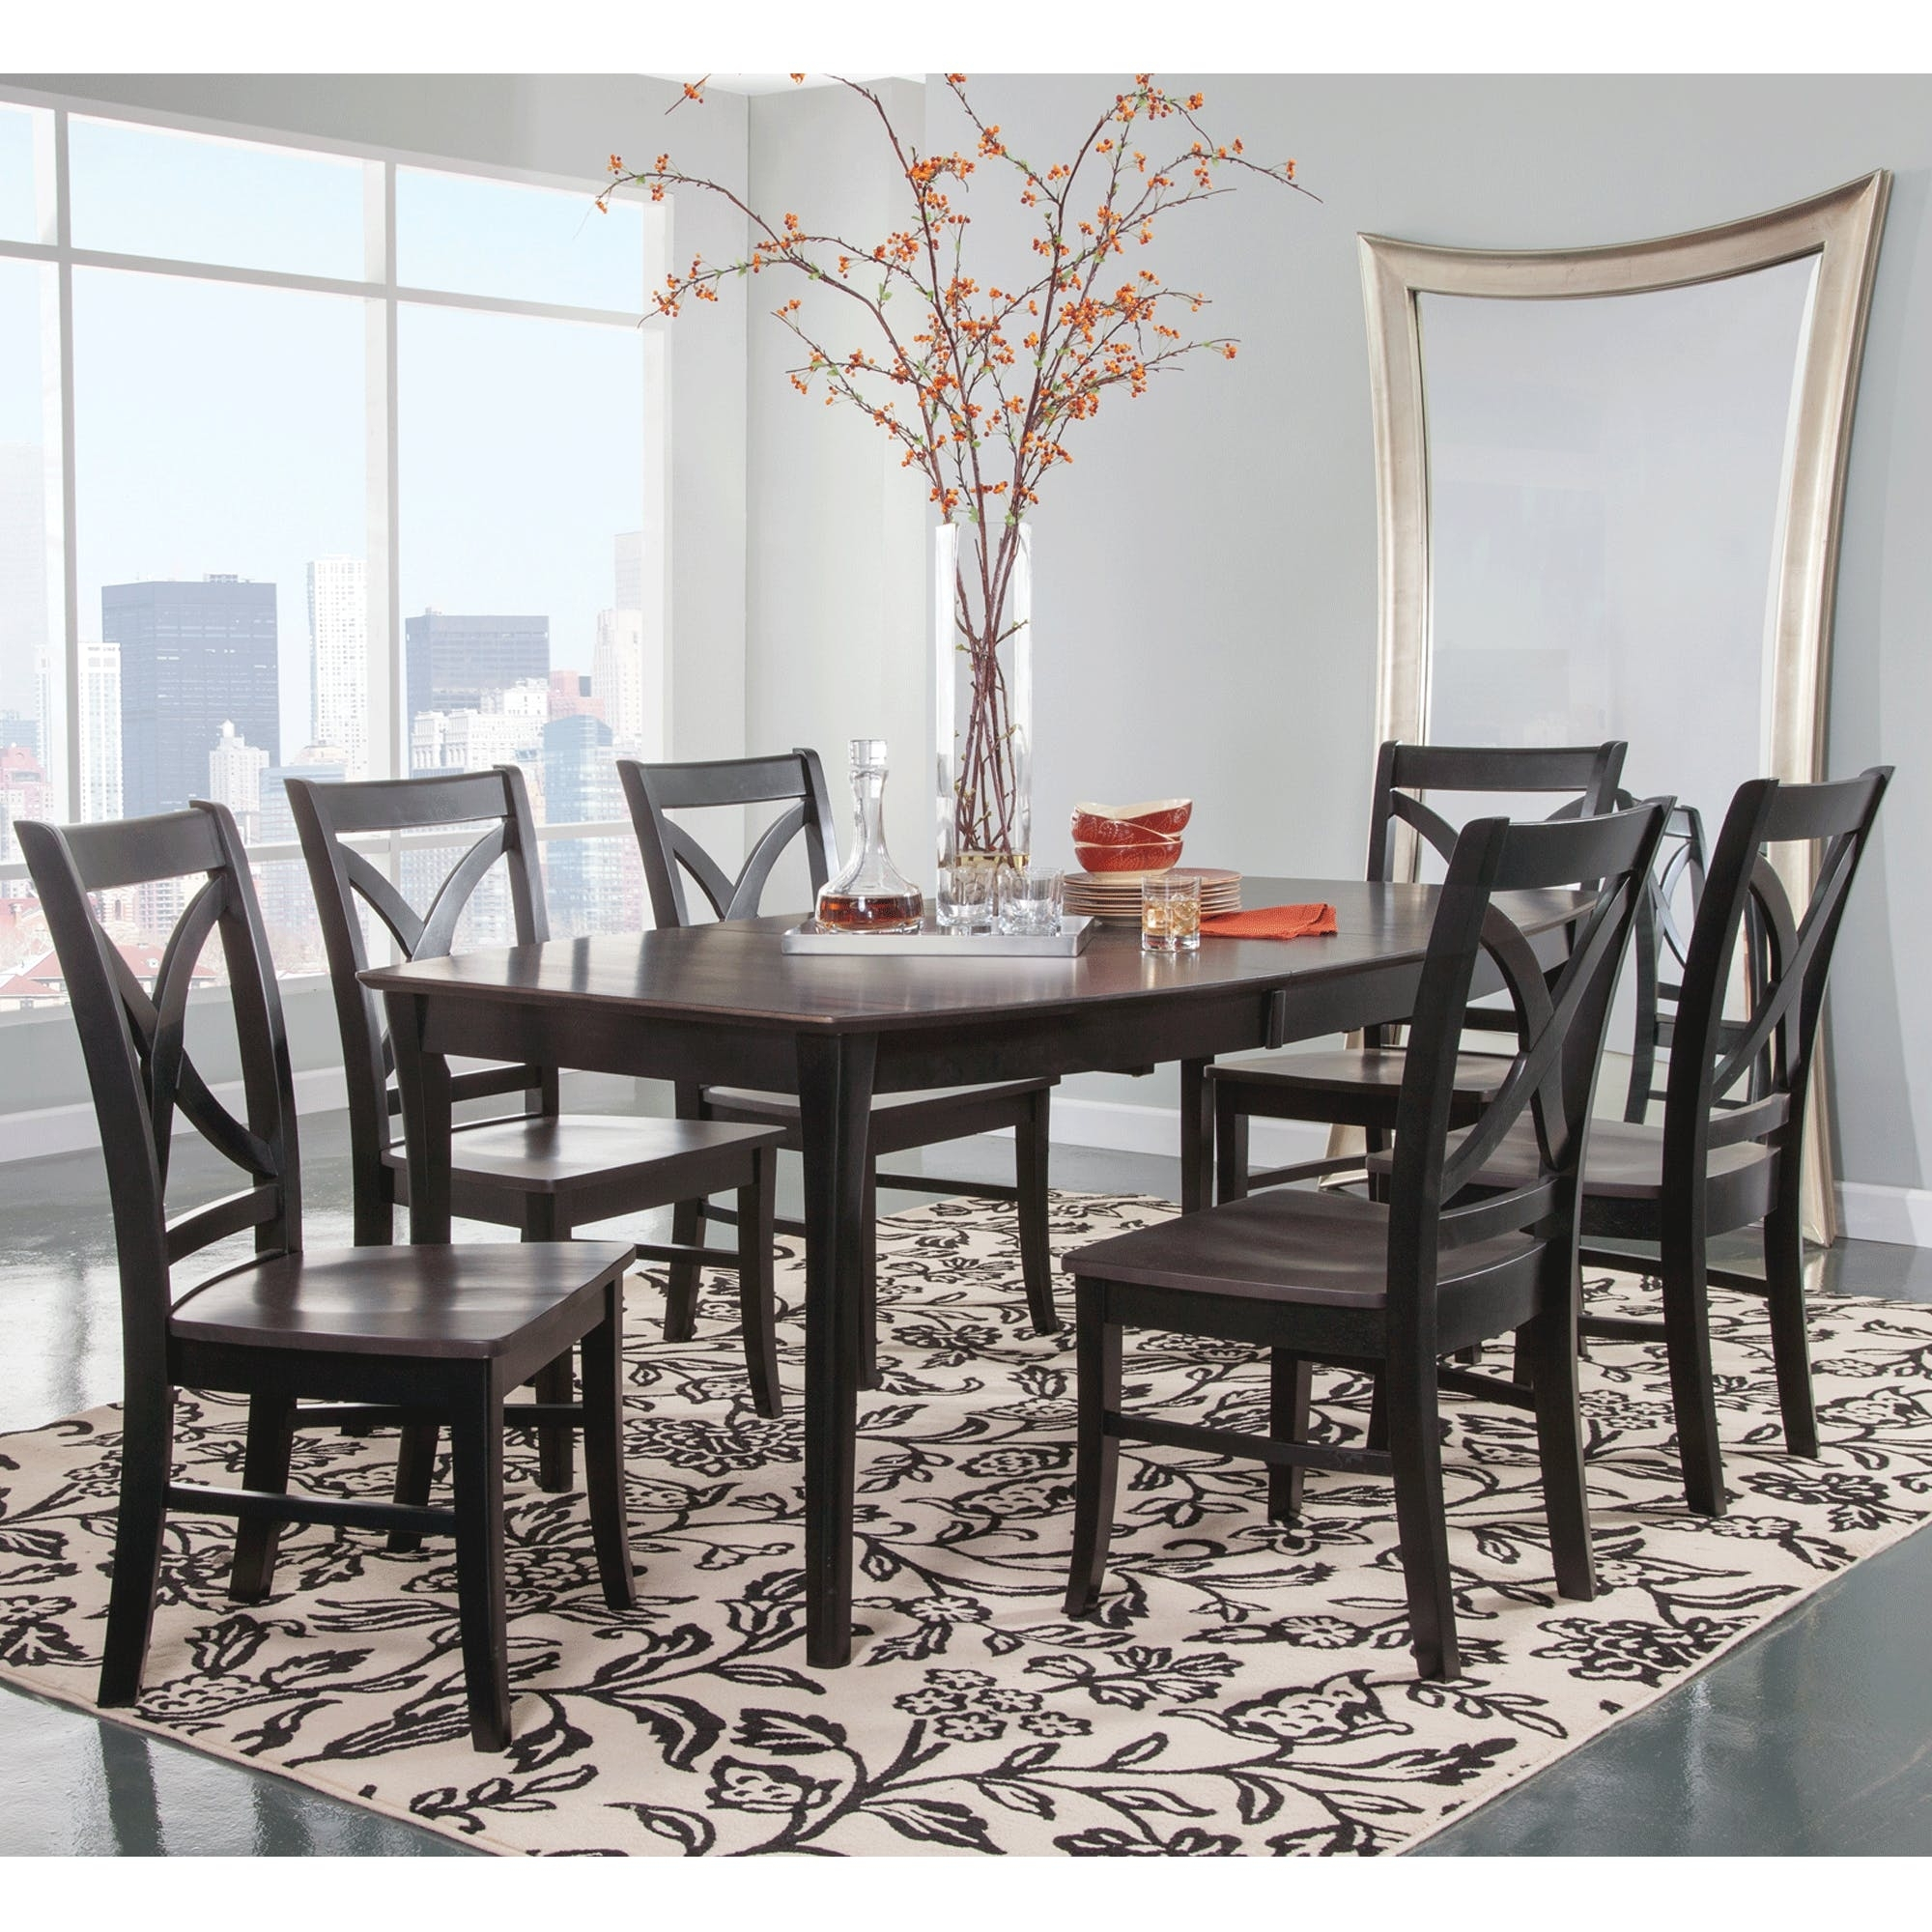 High Decorative Black Dining Room Sets Alanlegum Home Design inside dimensions 2000 X 2000